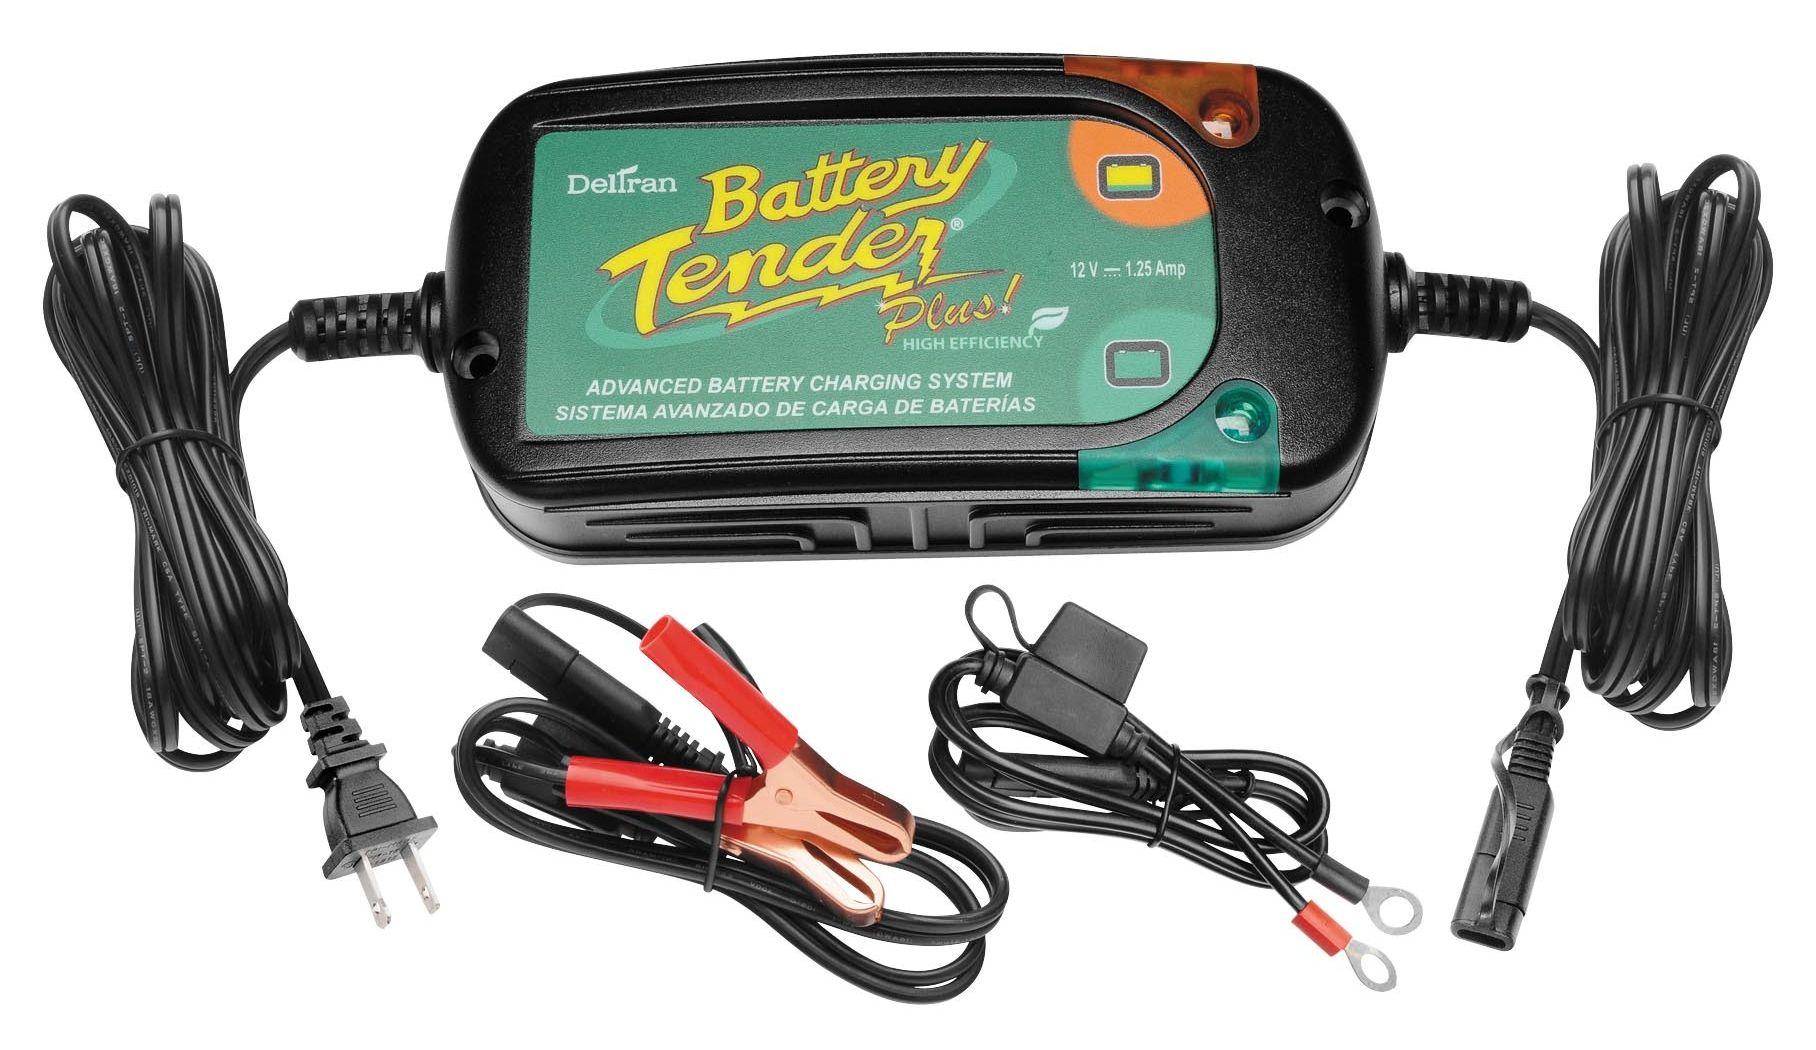 battery tender plus instructions